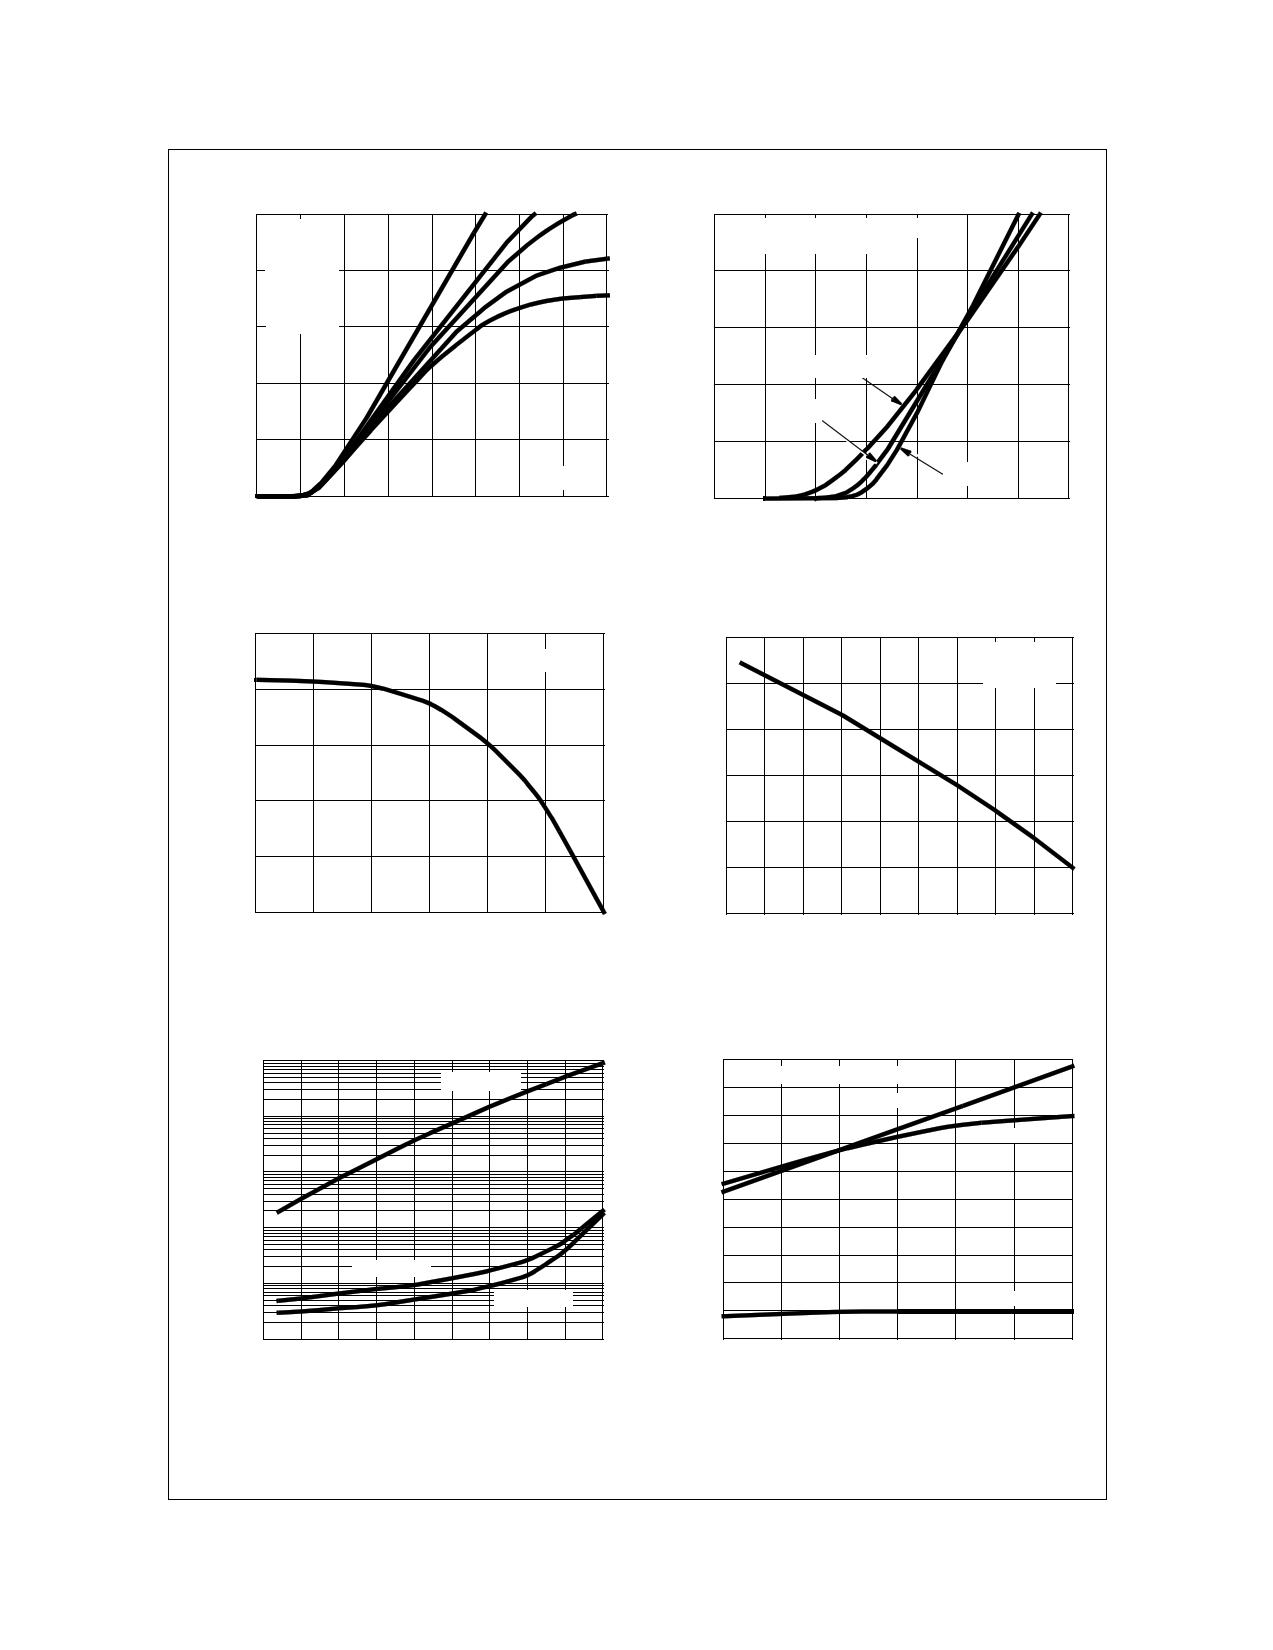 ISL9V3040S3S pdf, 반도체, 판매, 대치품